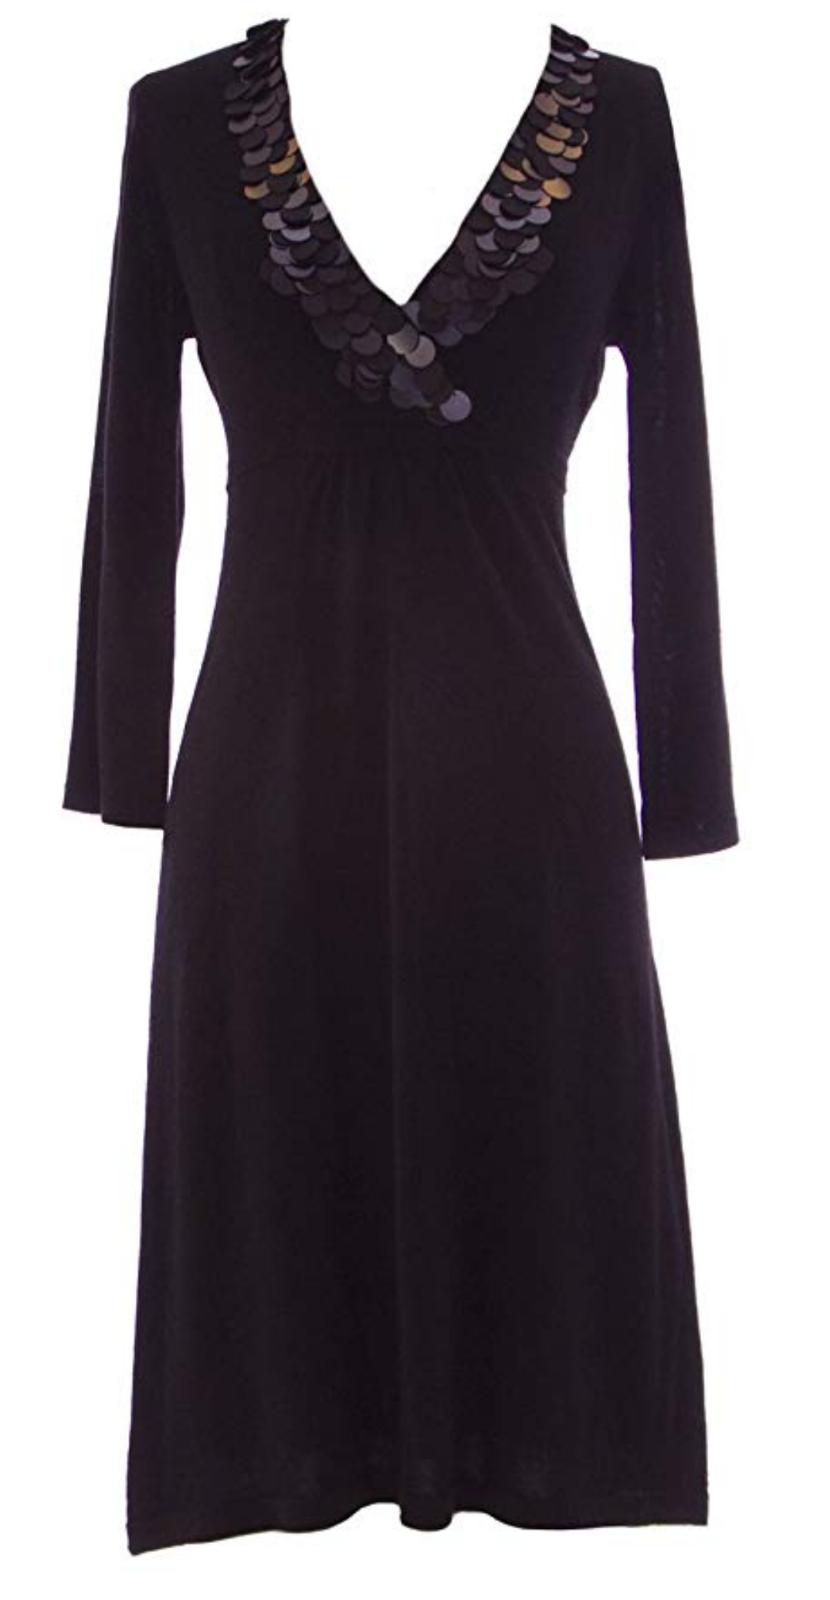 BODEN Paillette Detail Crotver schwarz Dress Größe 10 uk   CR181 EE 05